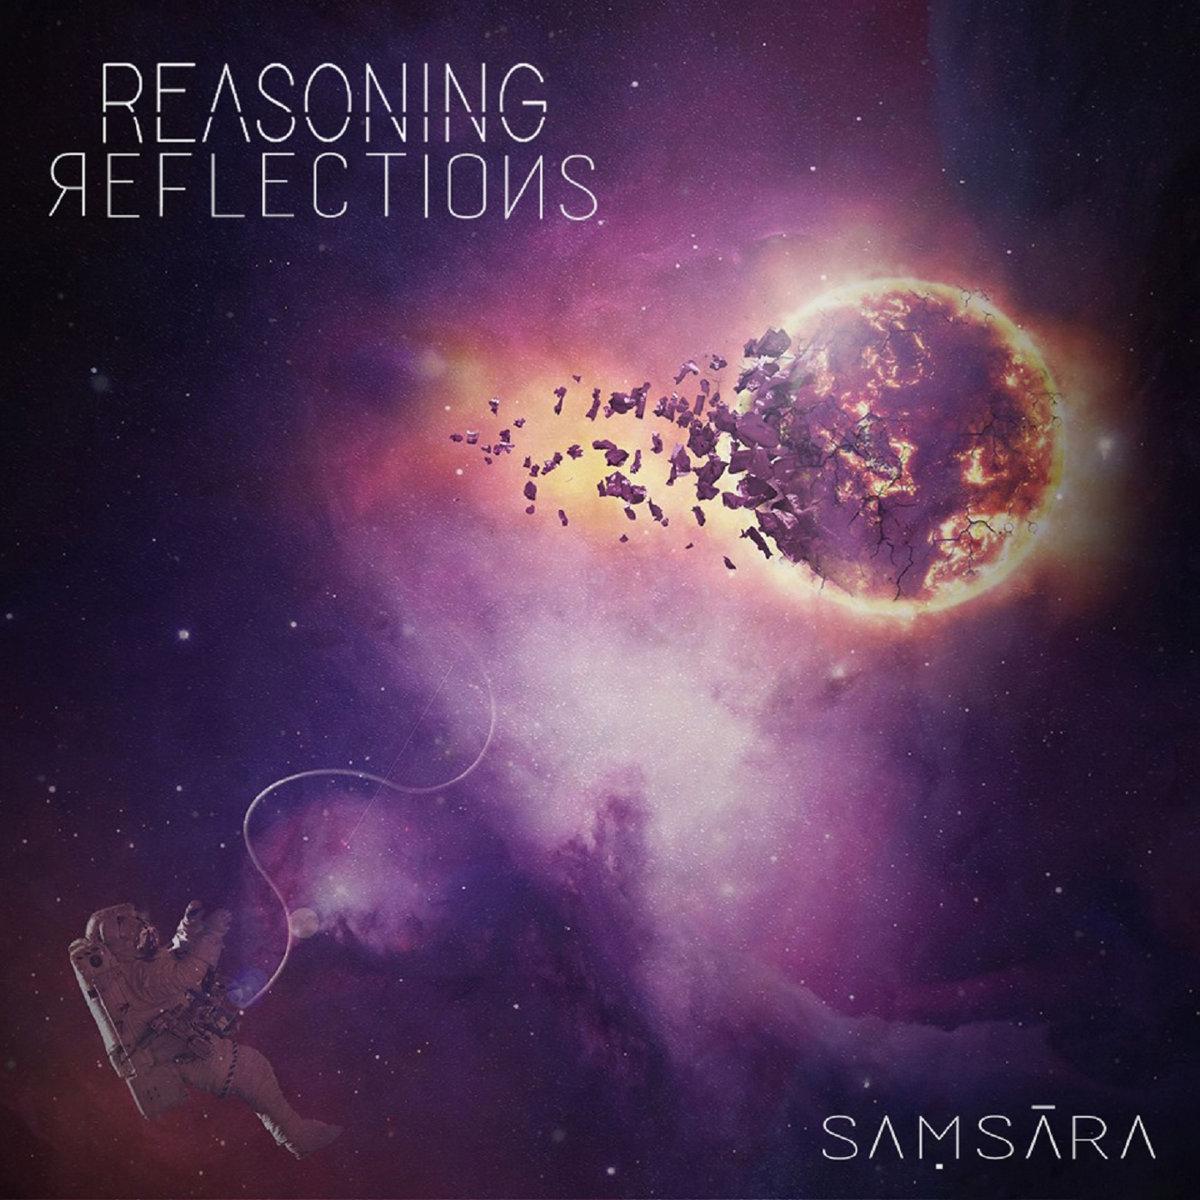 Fragments Of Reality Reasoning Reflections